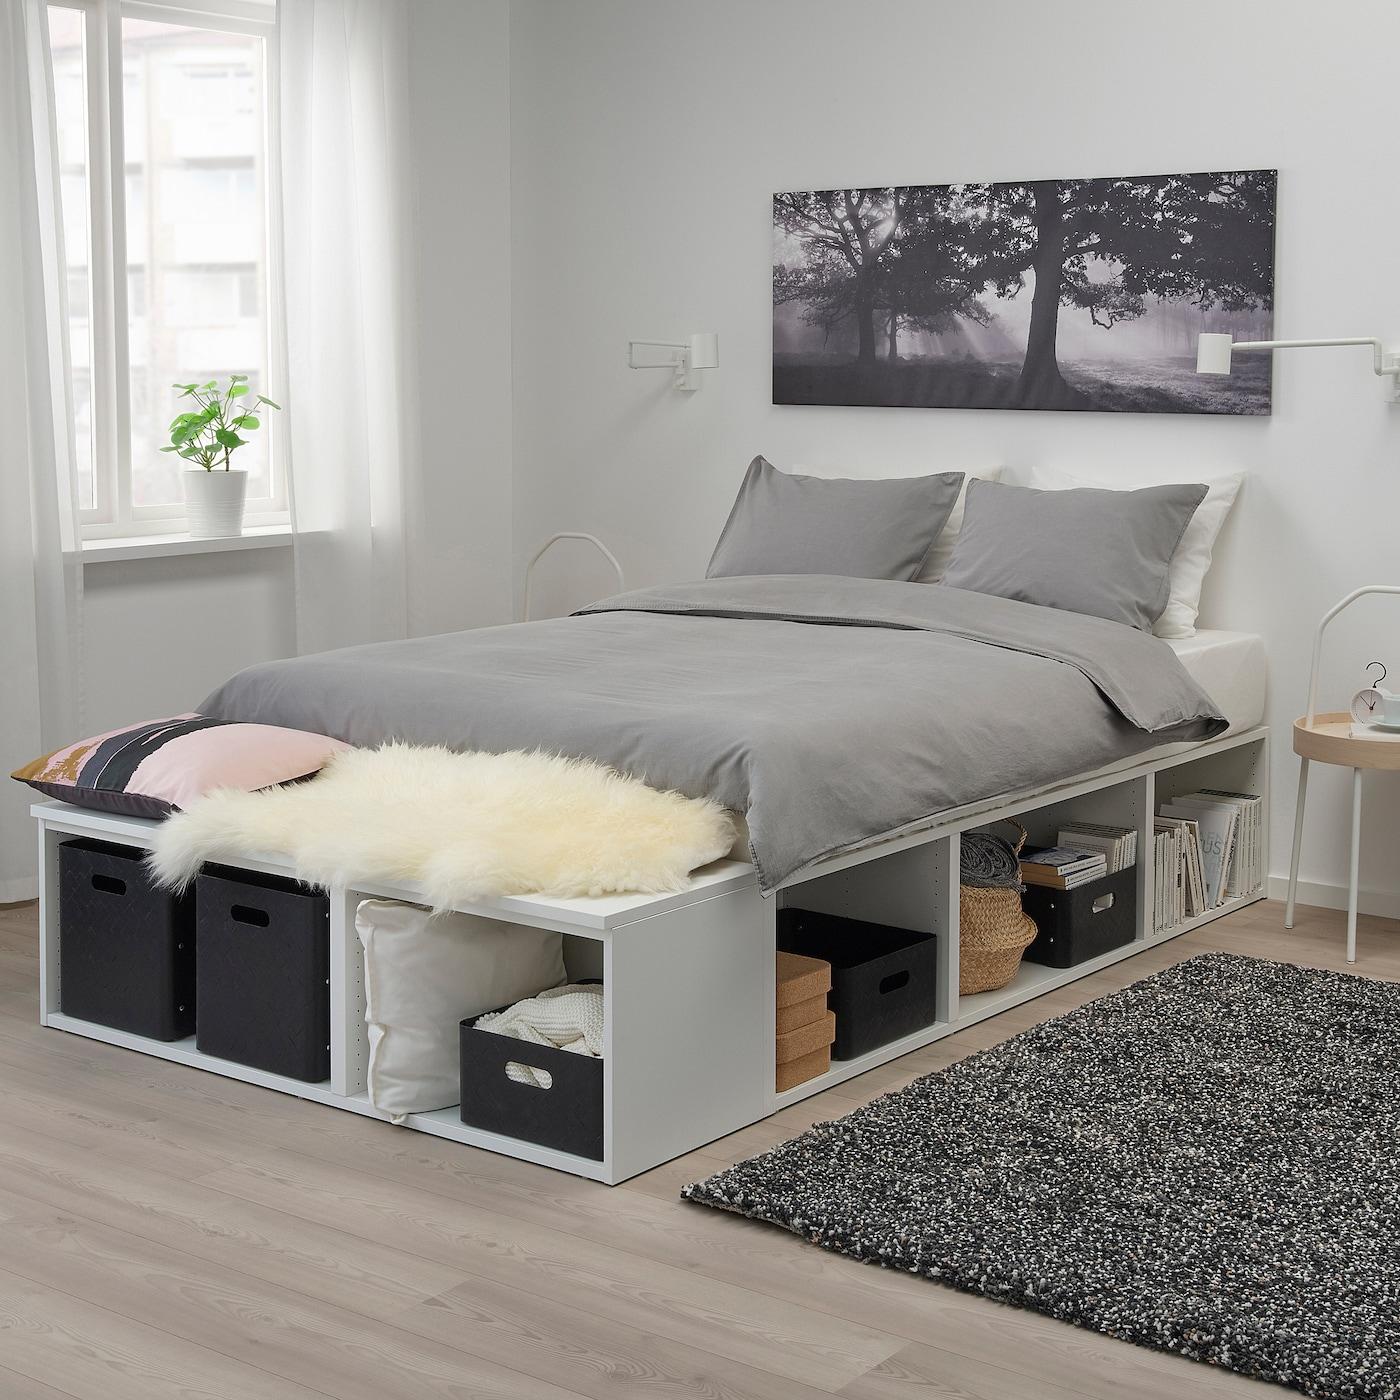 Picture of: Platsa Sengestel Med Opbevaring Hvid Ikea